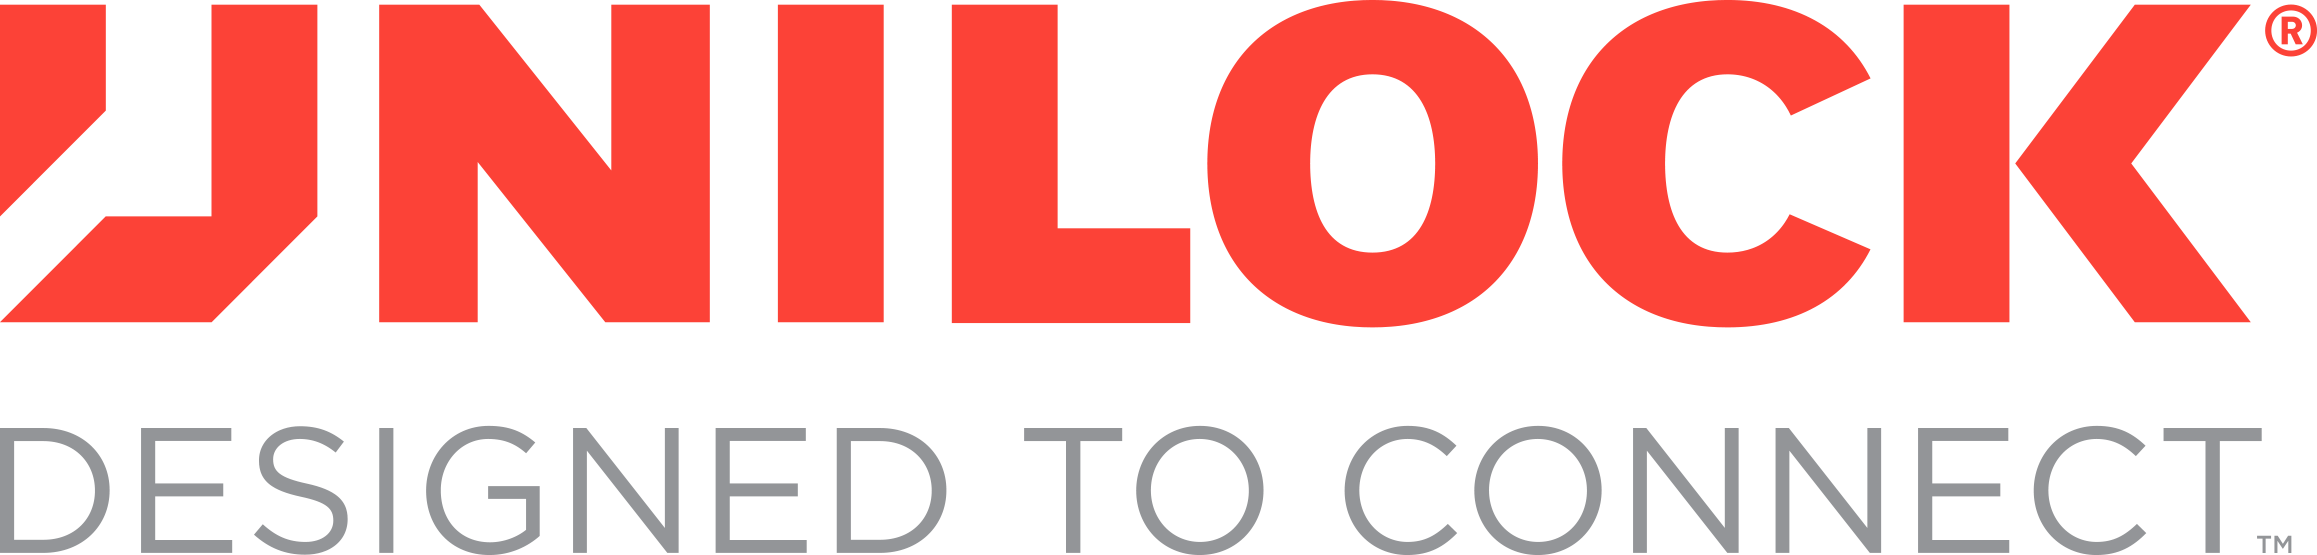 unilock-logo.png